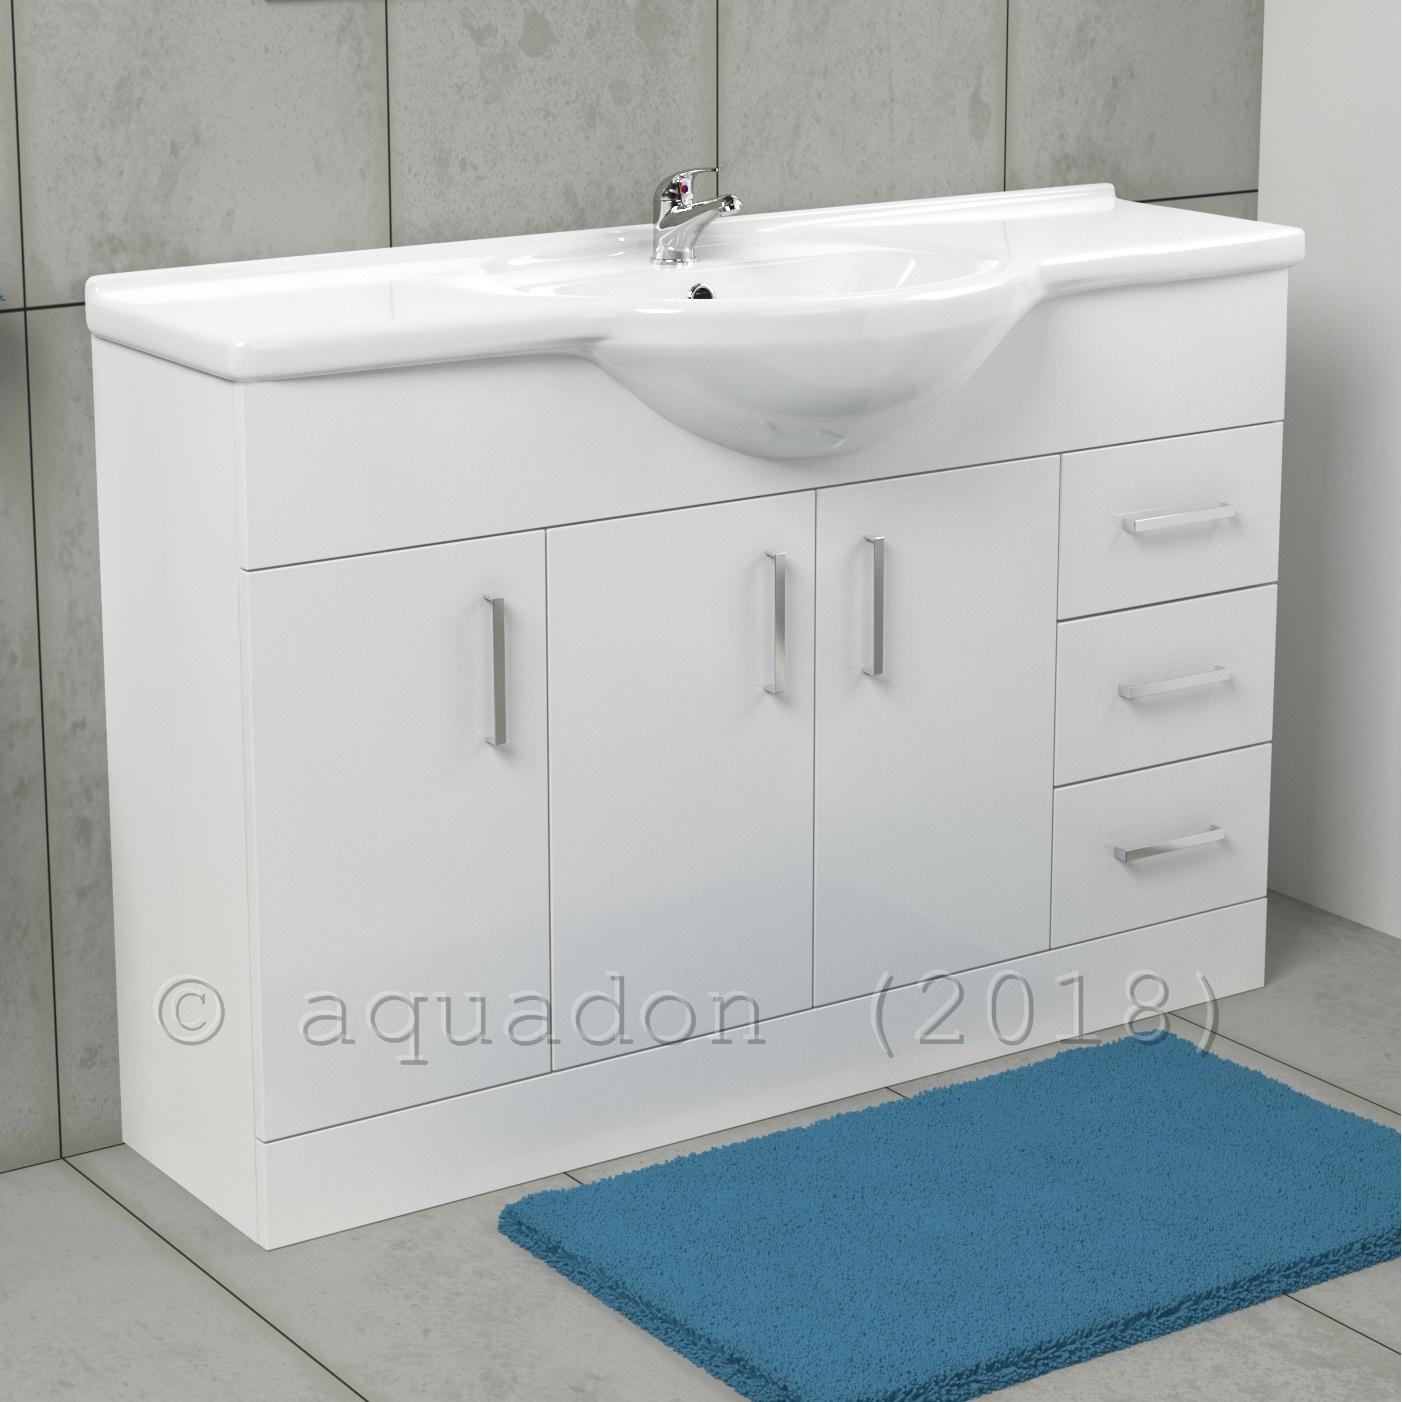 bathroom cloakroom gloss white vanity unit basin storage. Black Bedroom Furniture Sets. Home Design Ideas